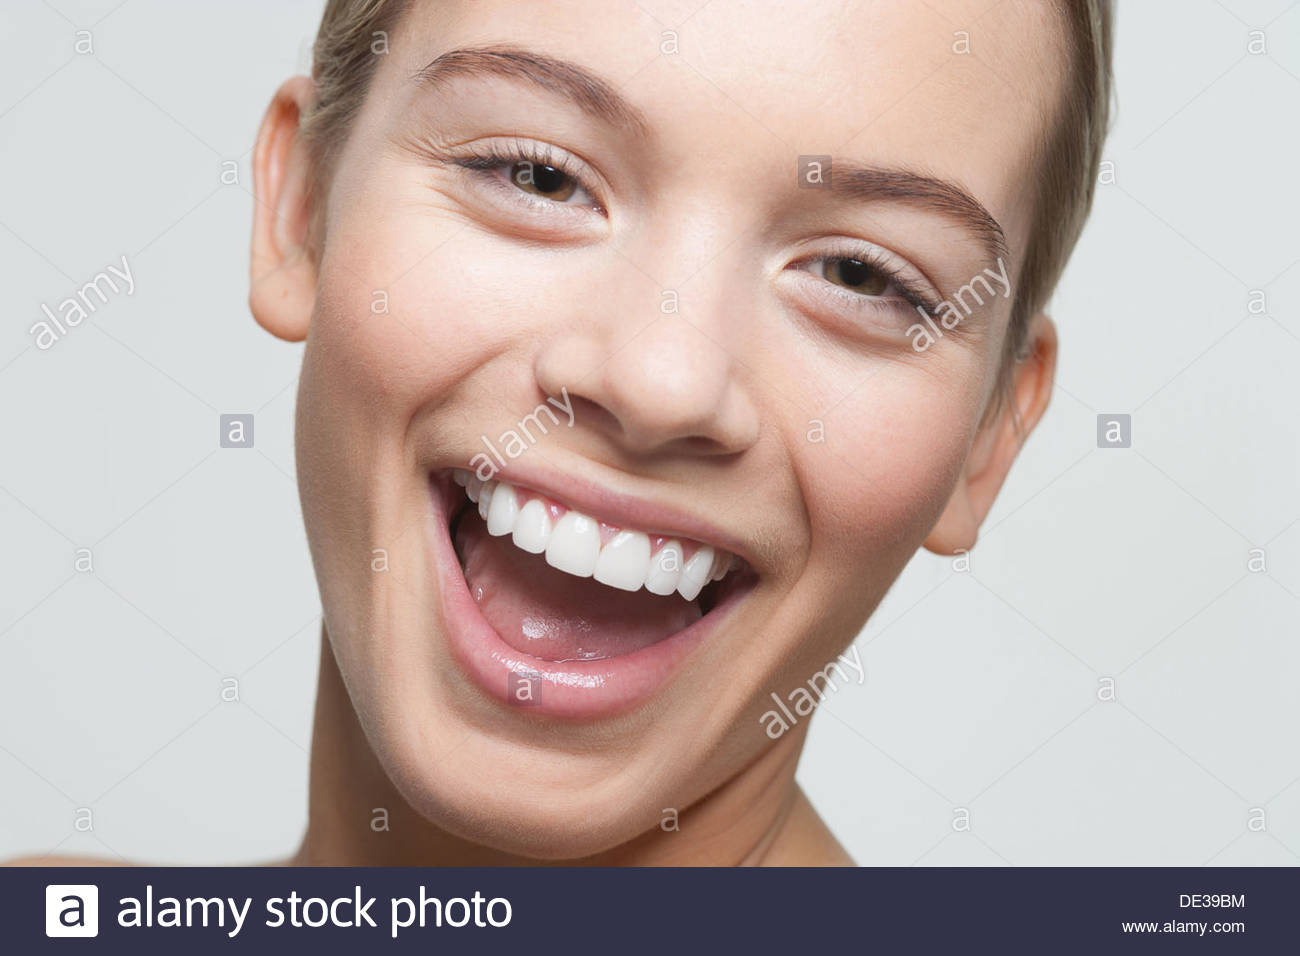 Close Up retrato de mujer riendo Imagen De Stock